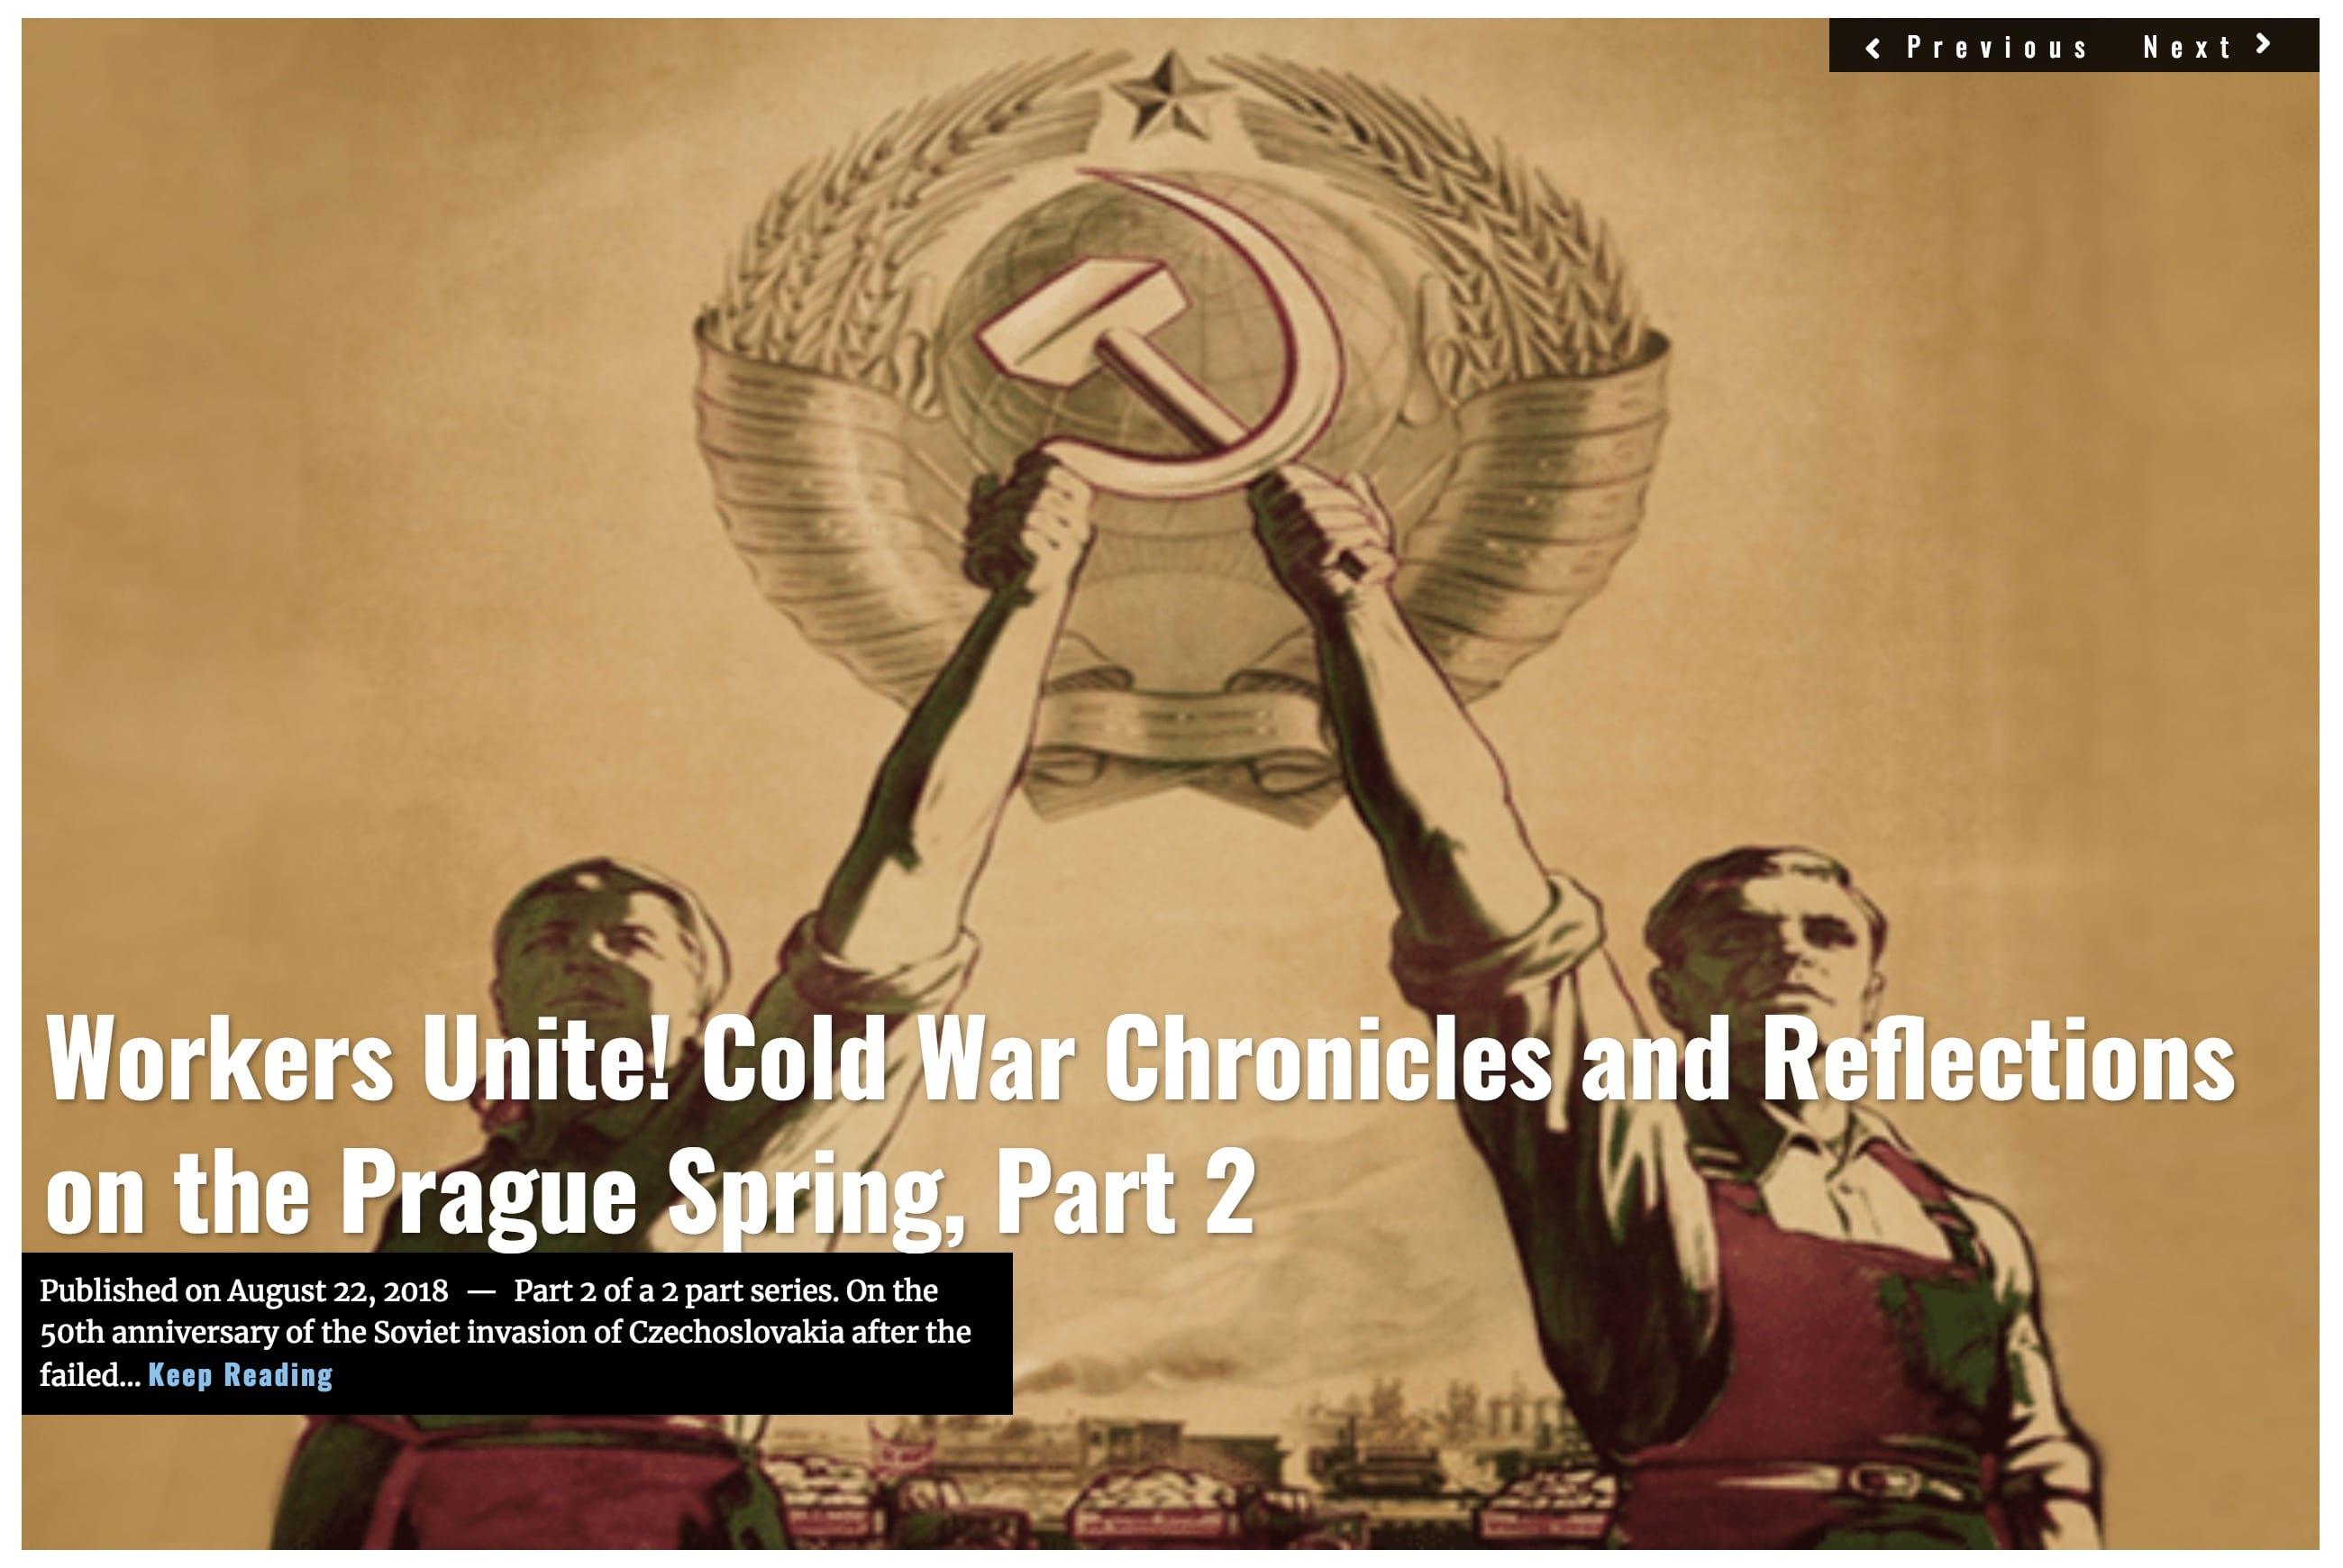 Image Lima Charlie News Headline Workers Unite - Prague Spring Part 2 AUG 22 2018 G.Busch